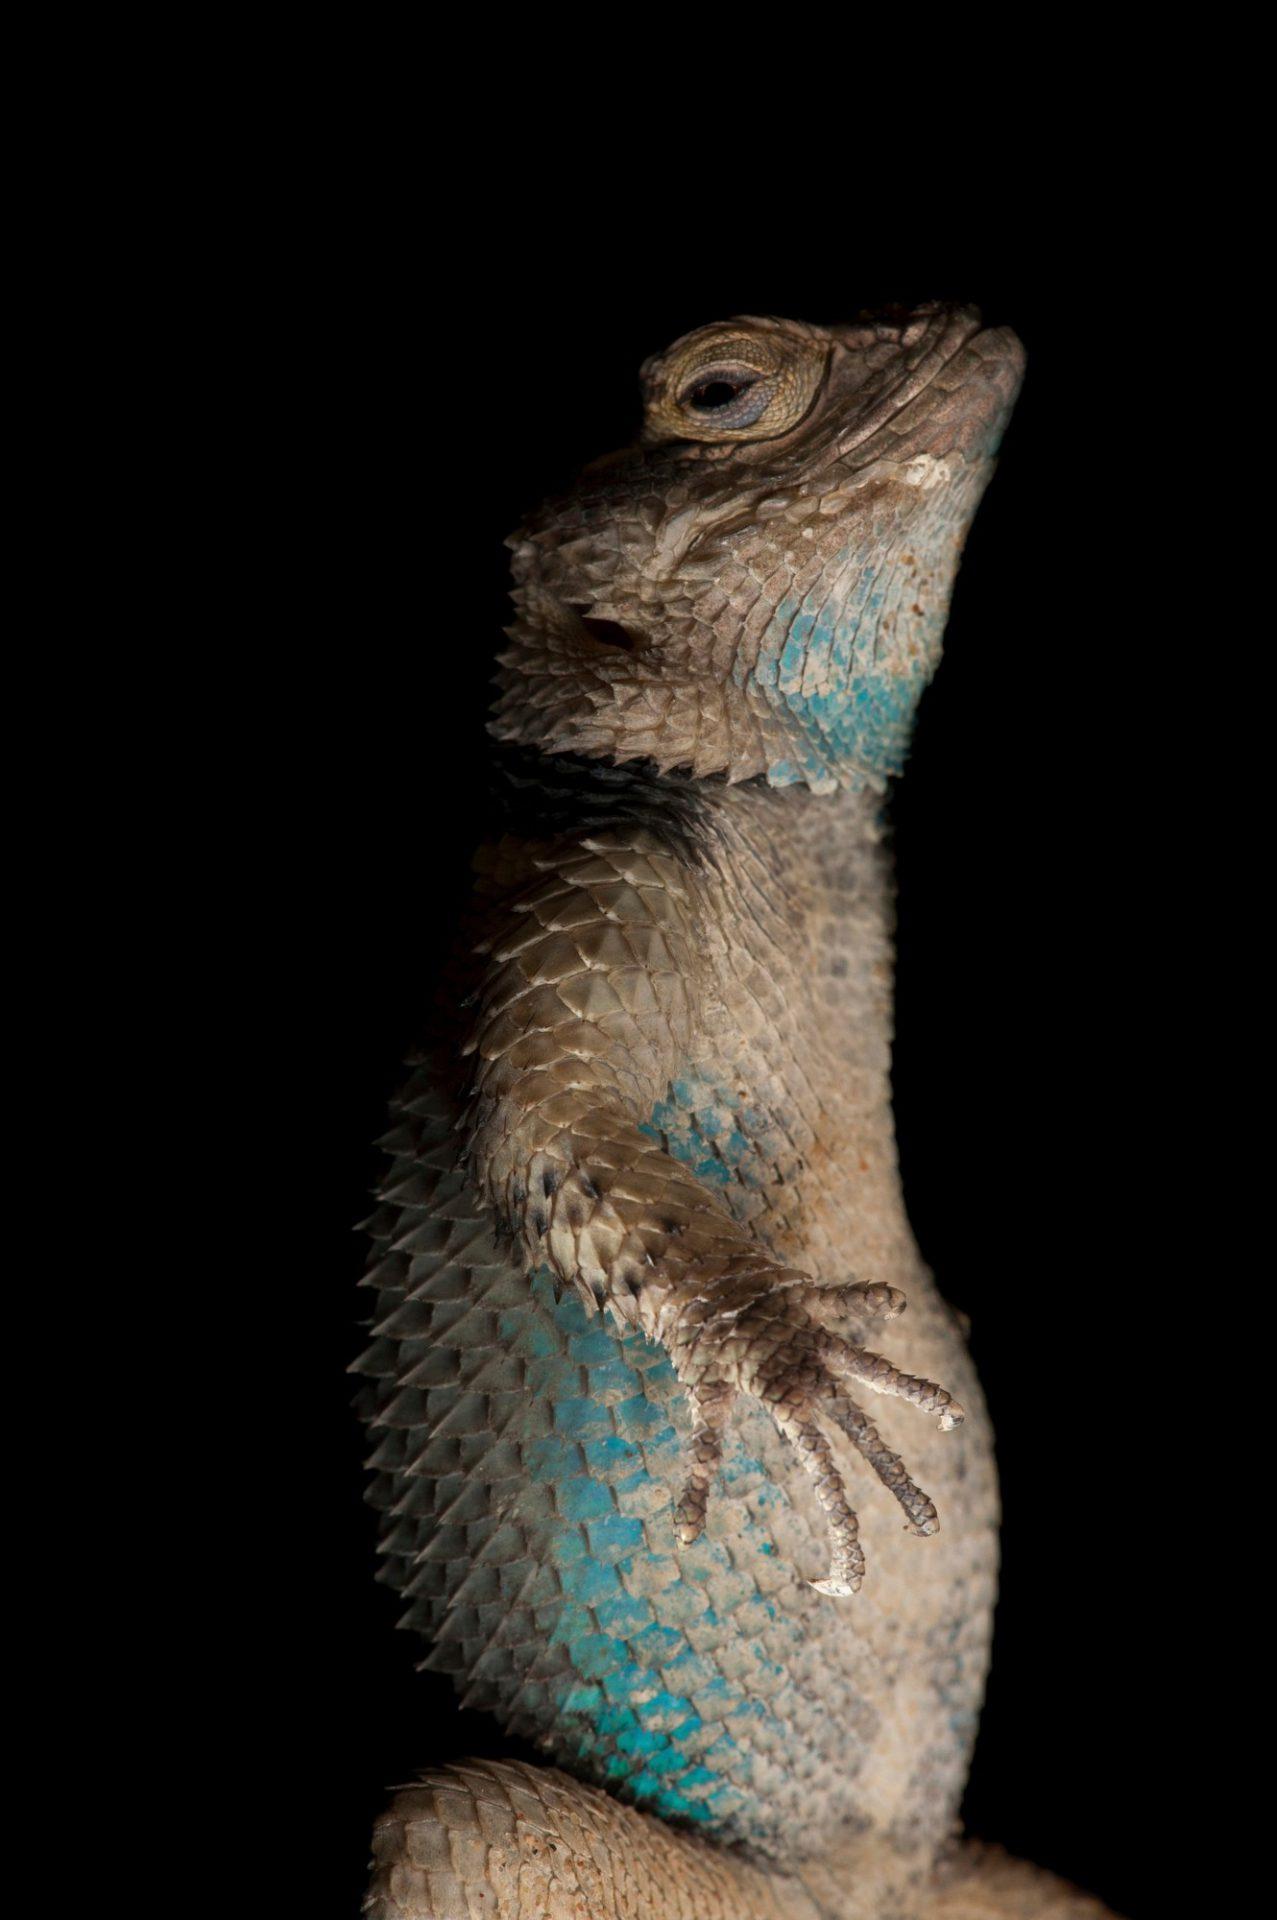 Photo: A blue spiny lizard (Sceloporus serrifer) at the Houston Zoo.